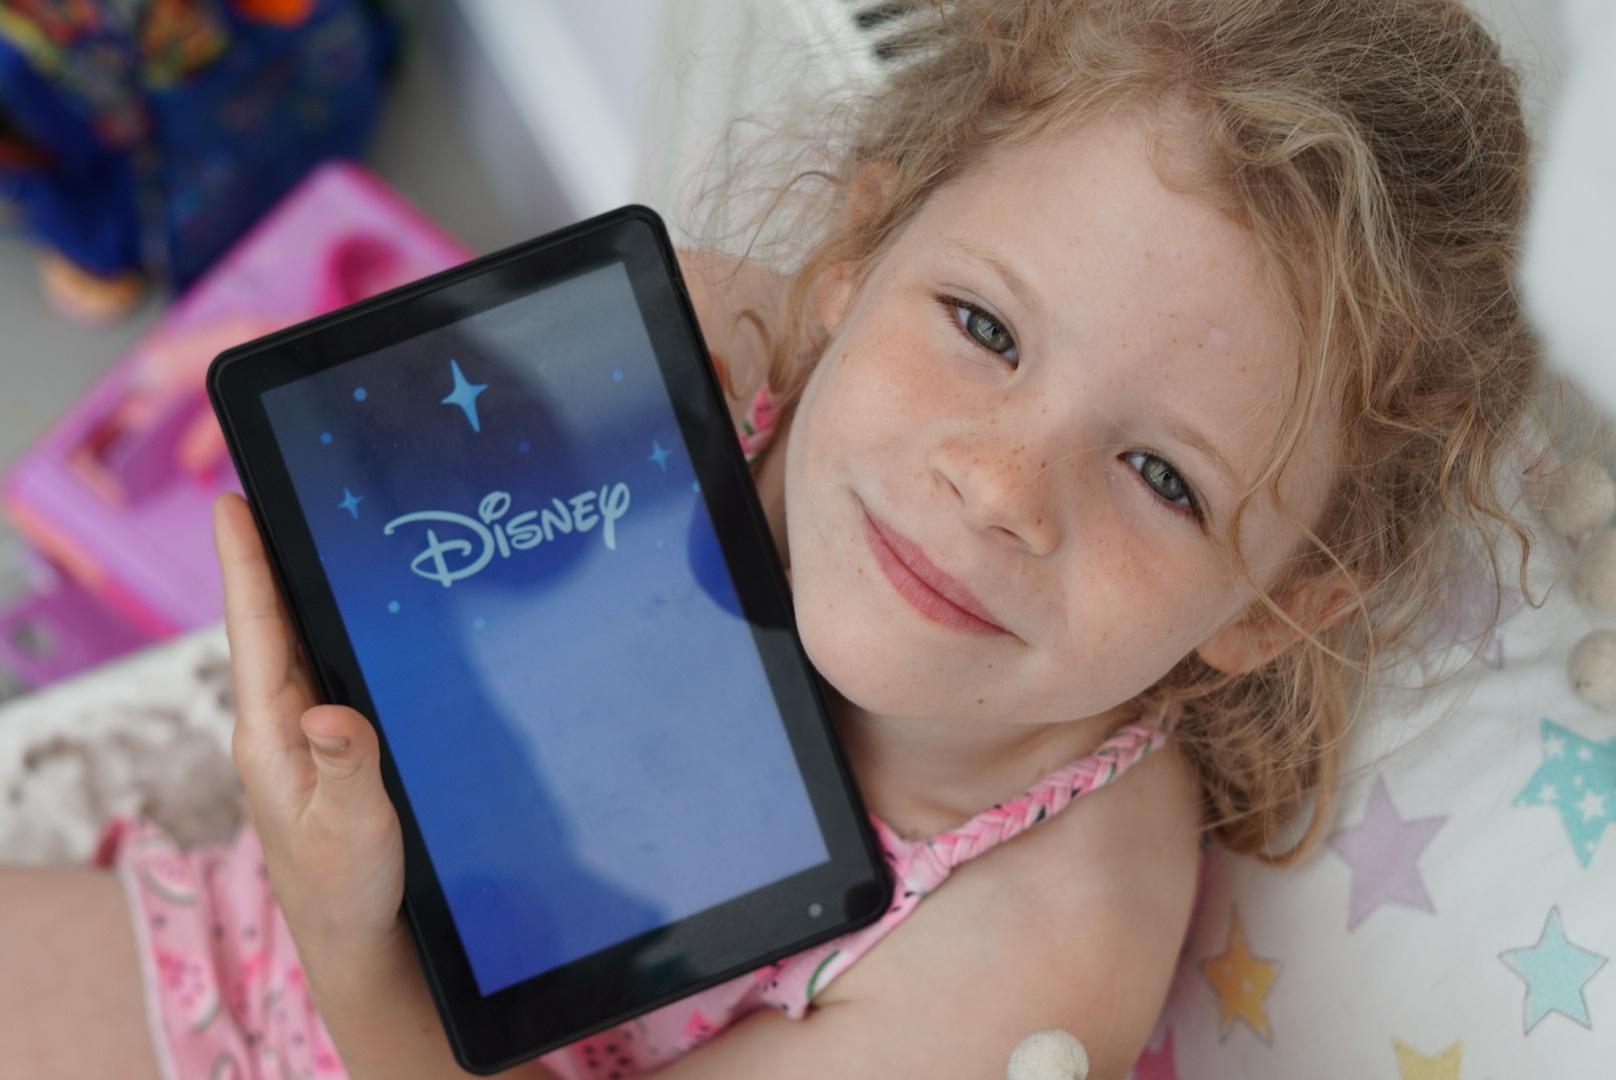 A family fun Mercury tablet that the children will enjoy